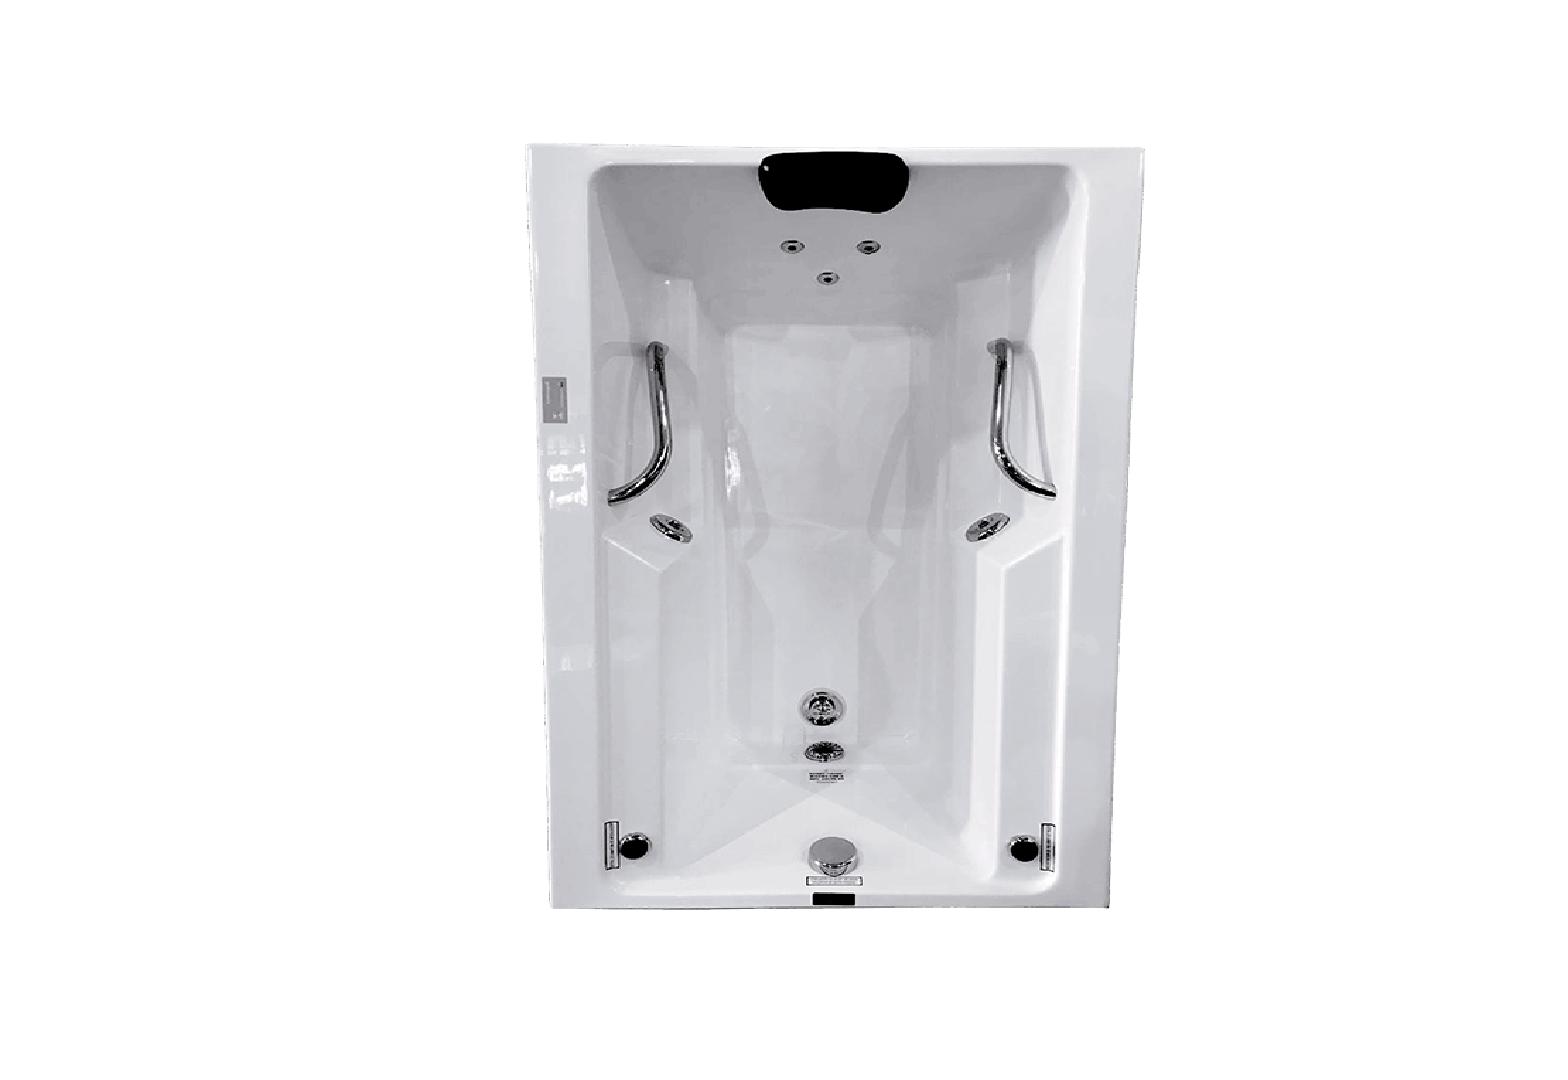 Banheira Hidro Rubi II COMPLETA - Jato de Hidro, LED (1,50x0,90)